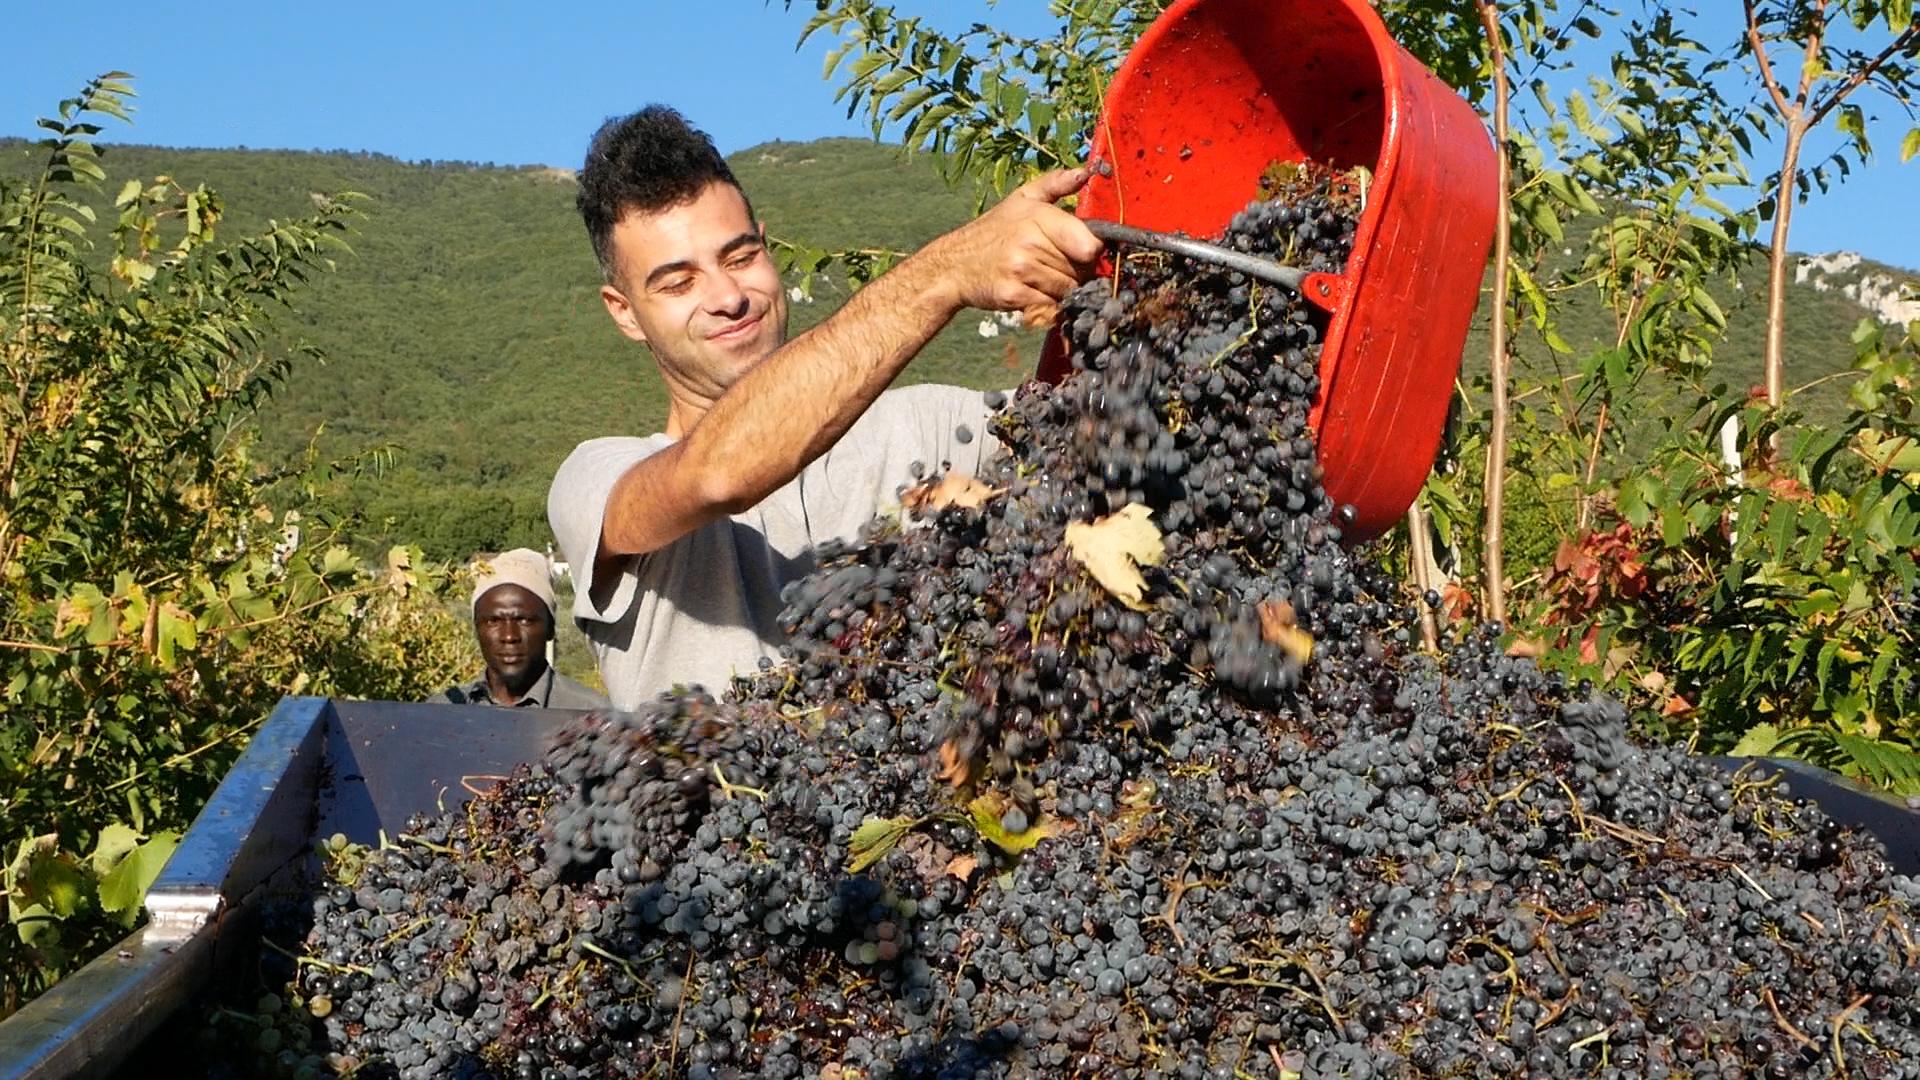 Esperienza sensoriale Assisi Tili Vini - Vendemmiamo insieme 4